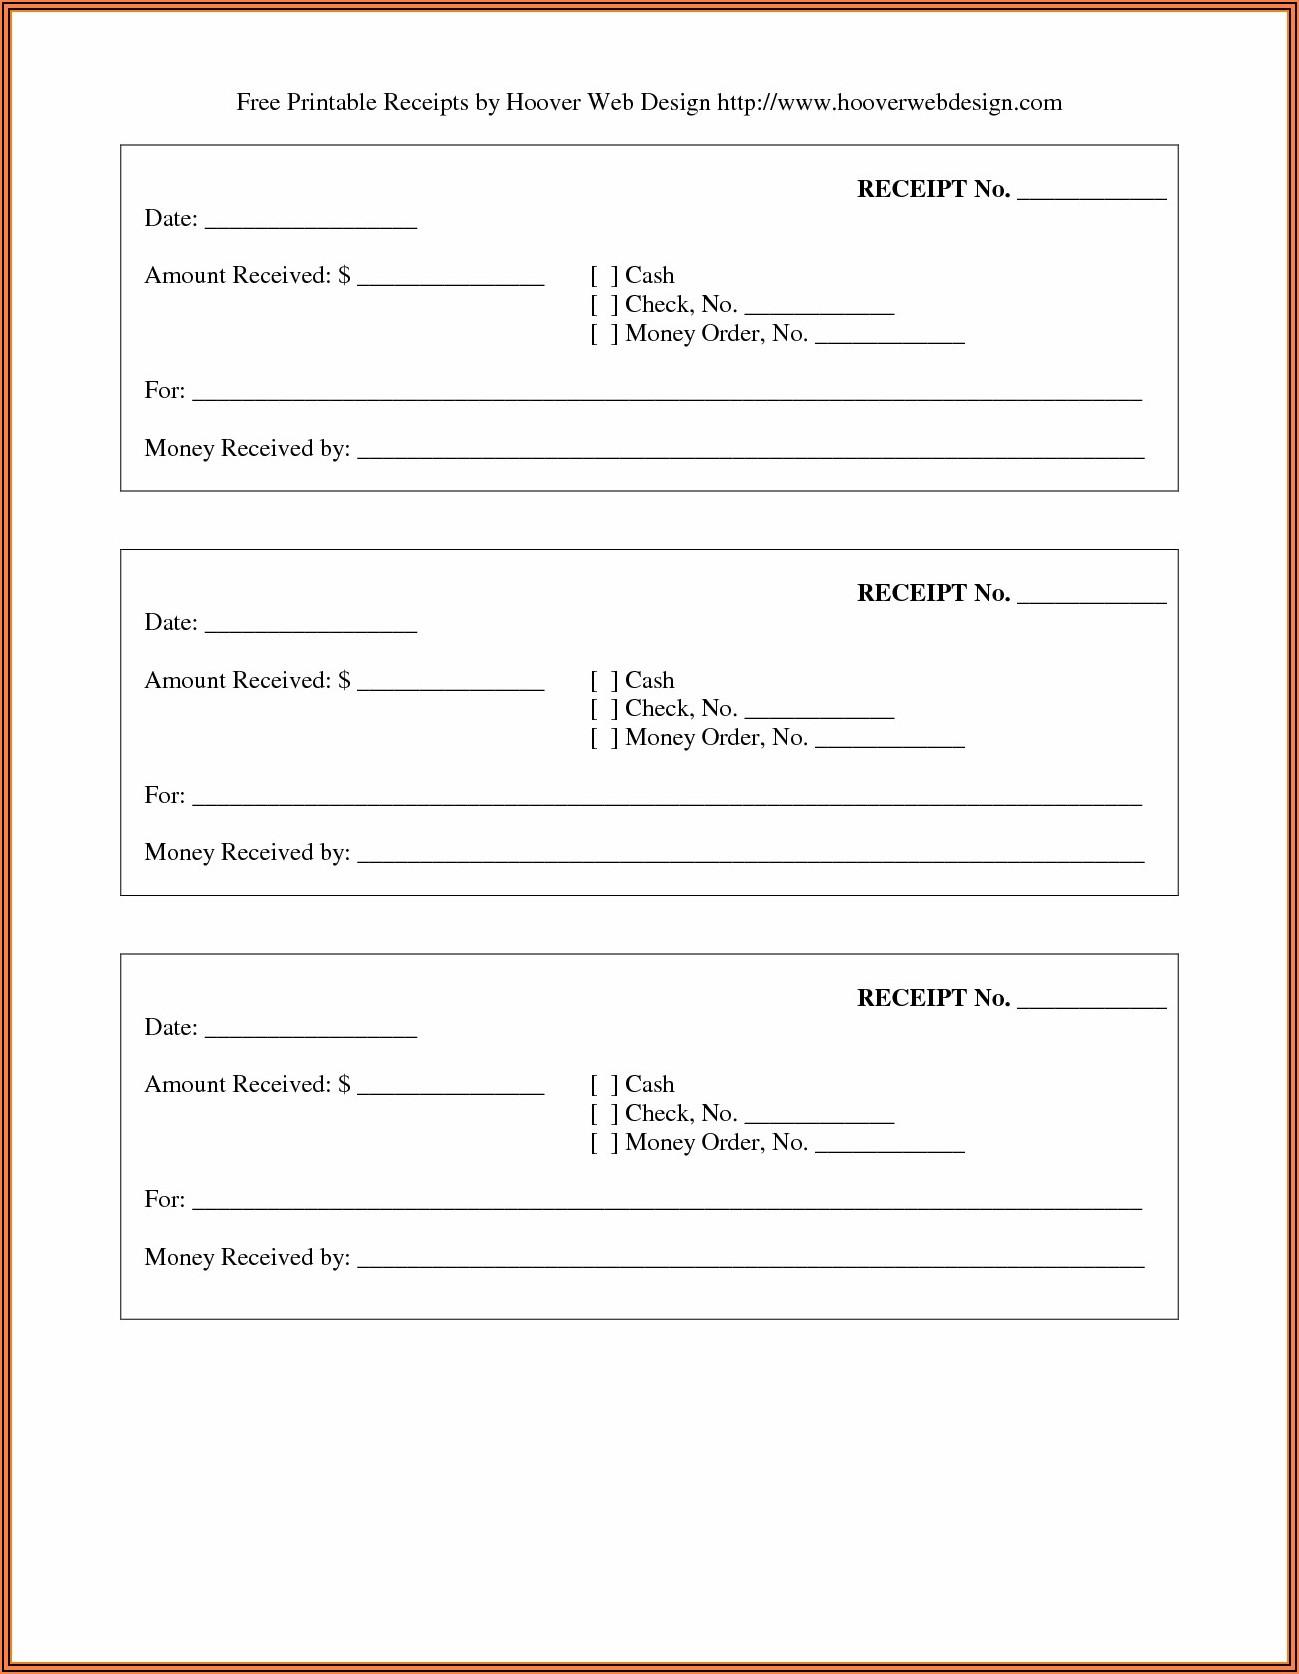 Free Printable Rent Receipt Forms